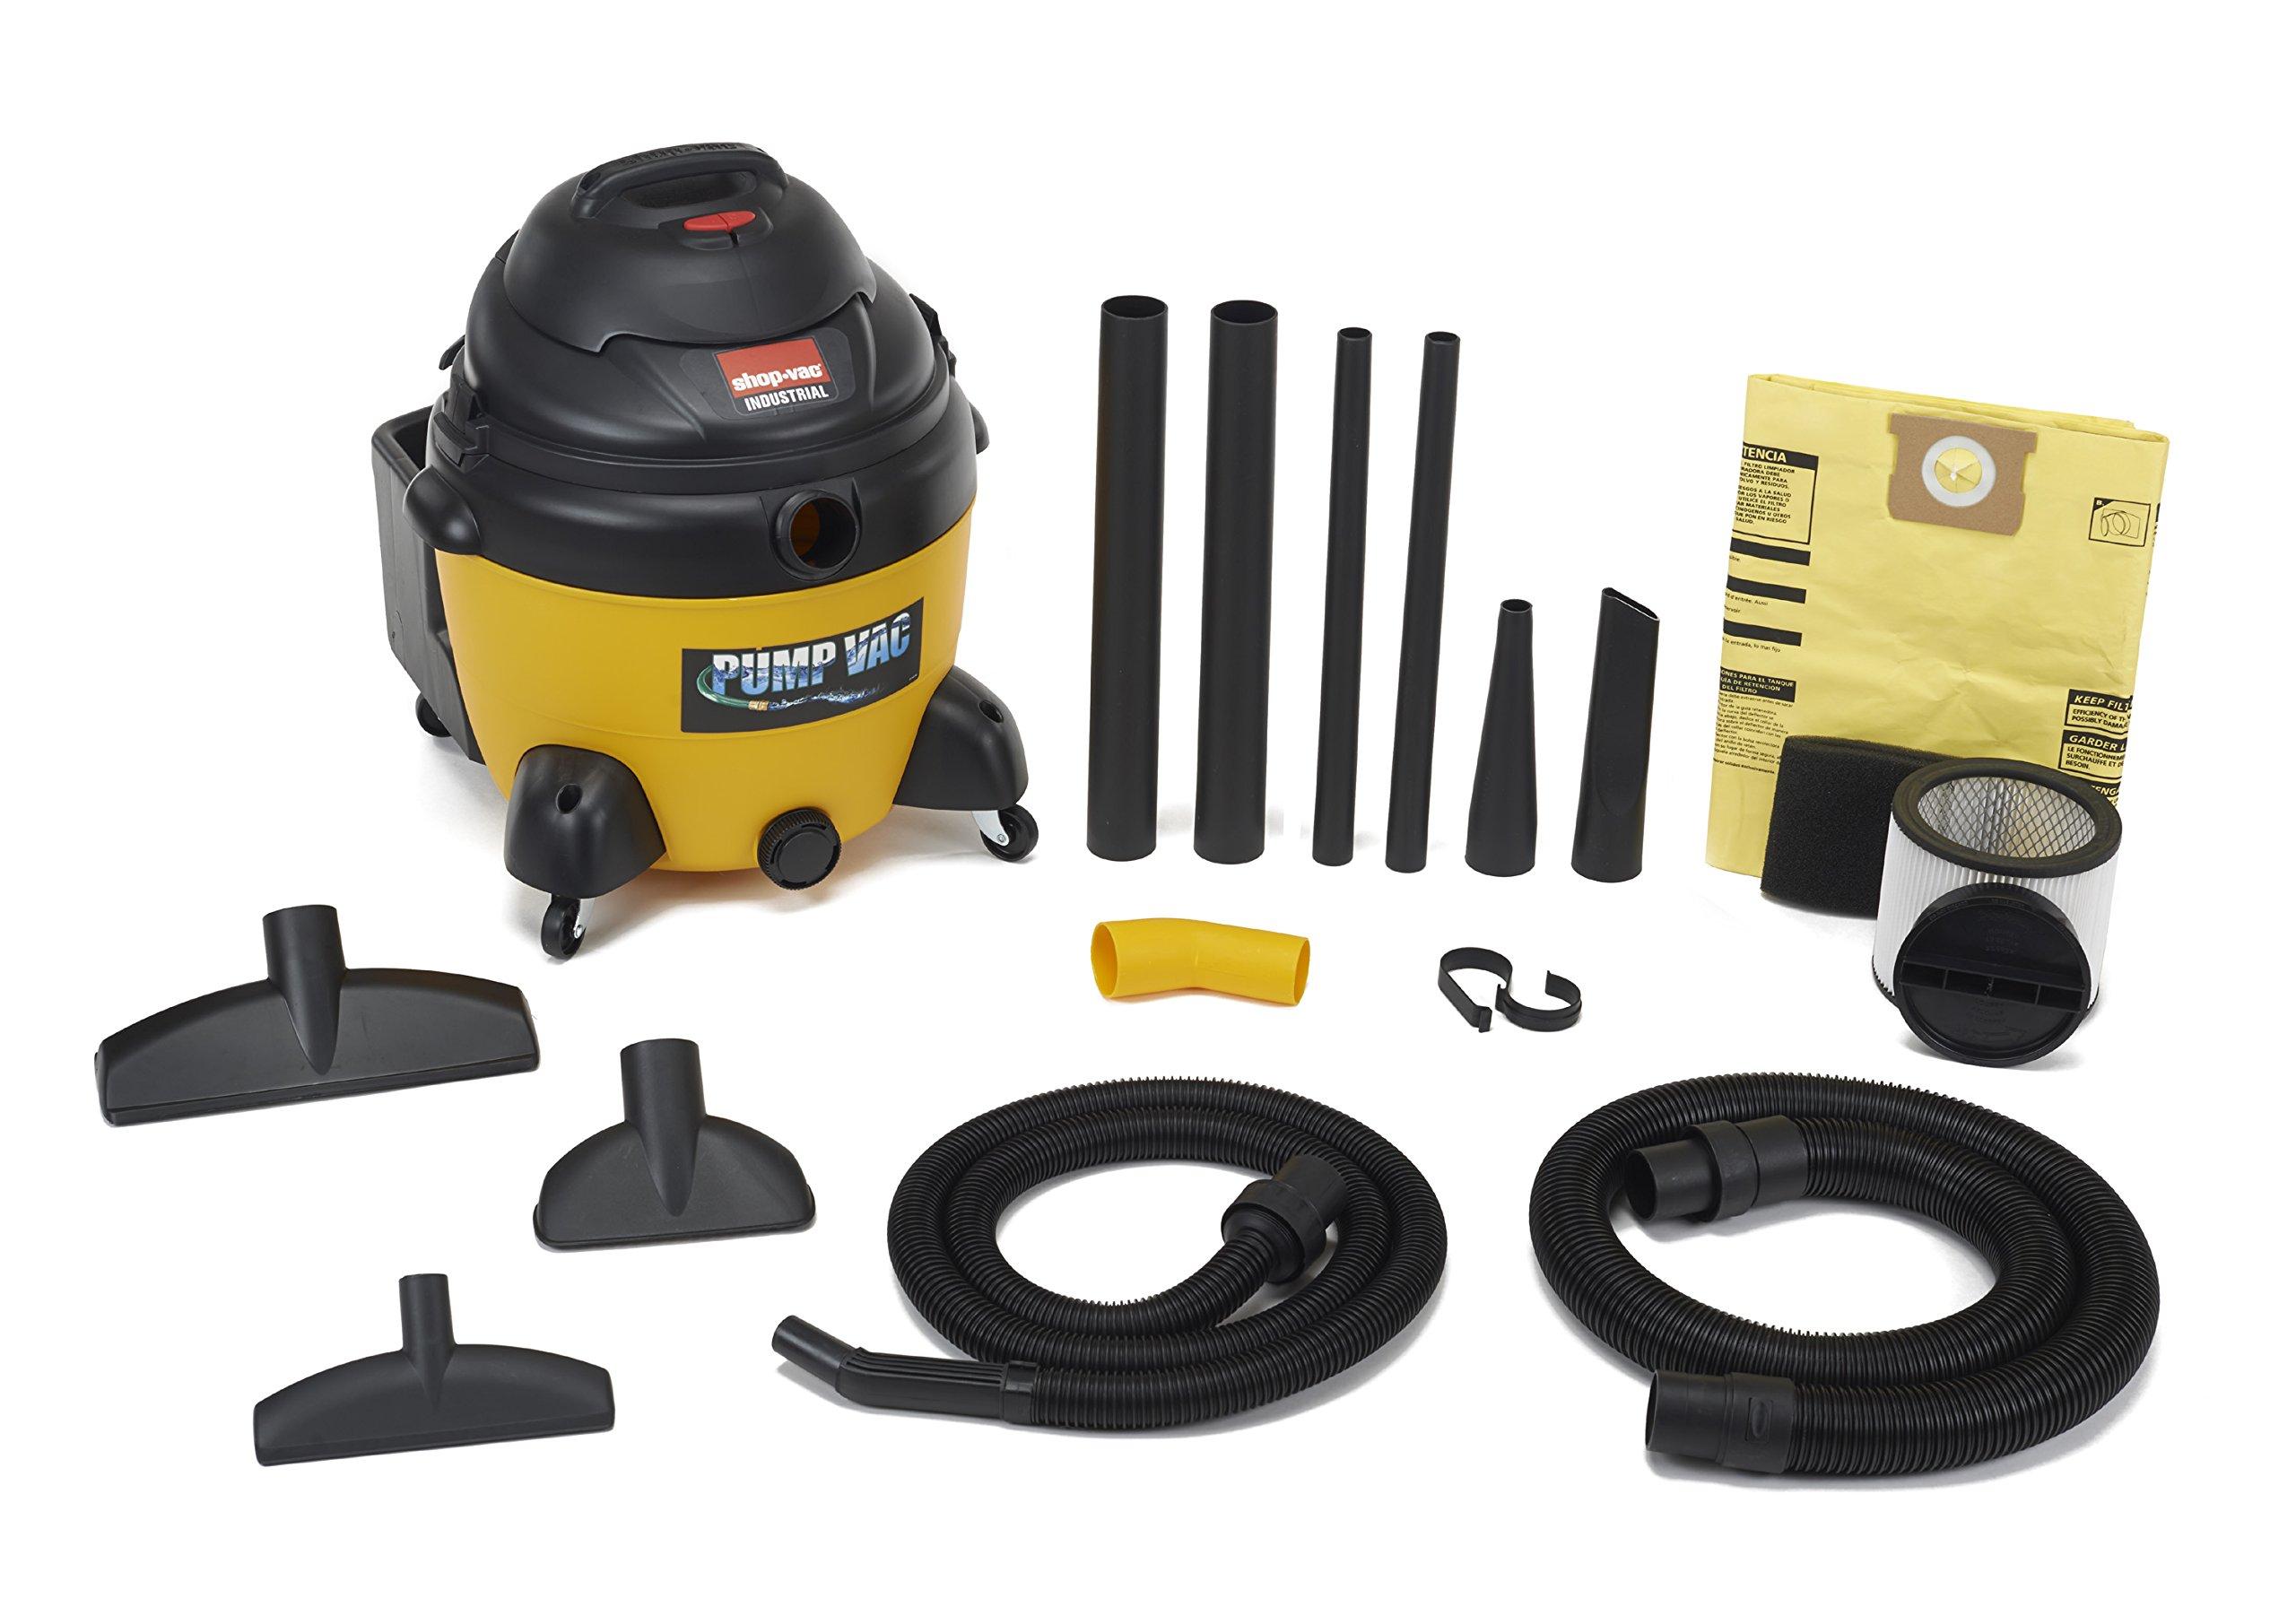 Shop-Vac 9604610 6.5 Peak HP wet Dry Vacuum with Built in Pump, 16-Gallon by Shop-Vac (Image #2)